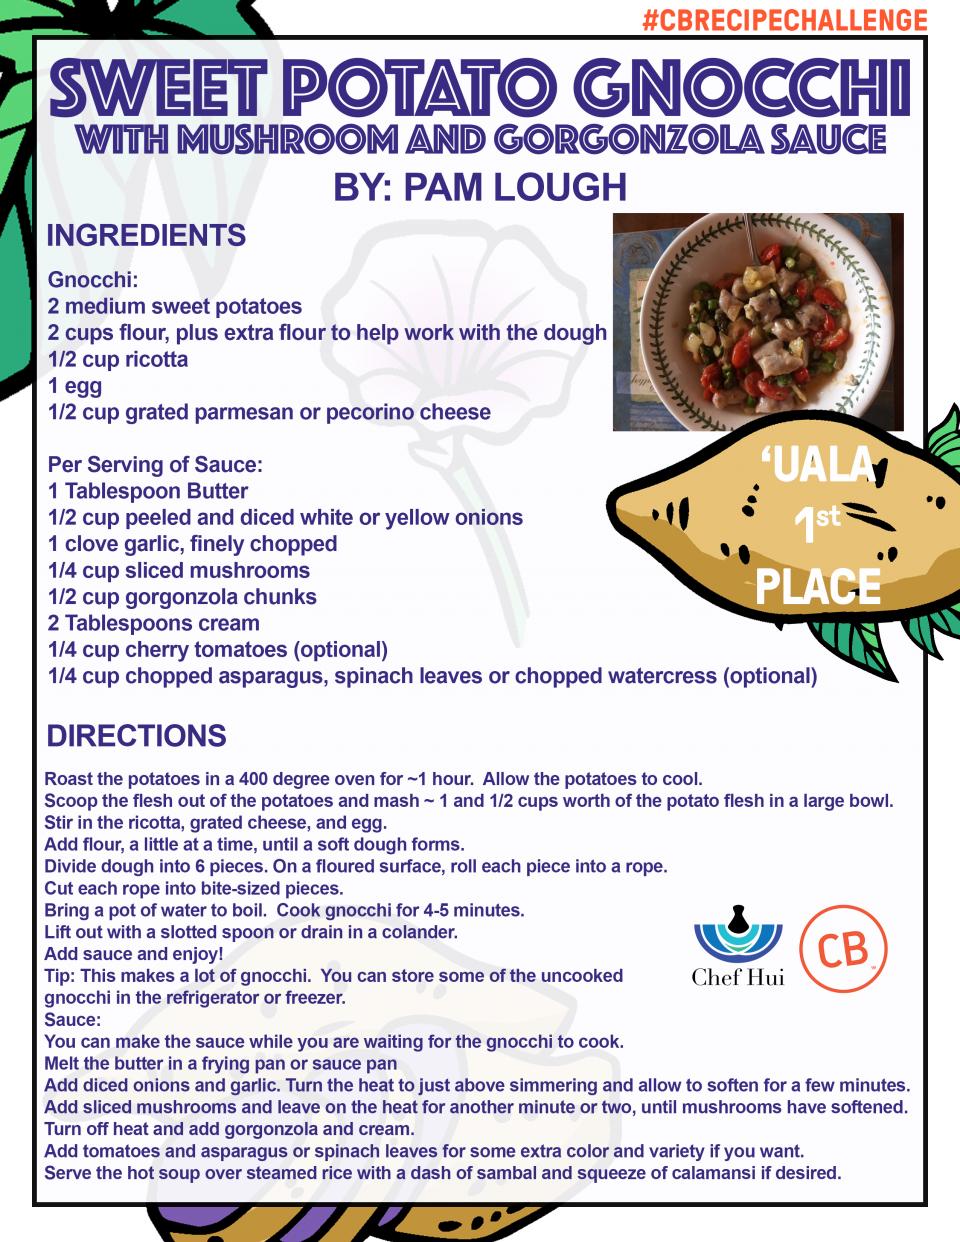 Sweet Potato Gnocchi with Mushroom and Gorgonzola Sauce